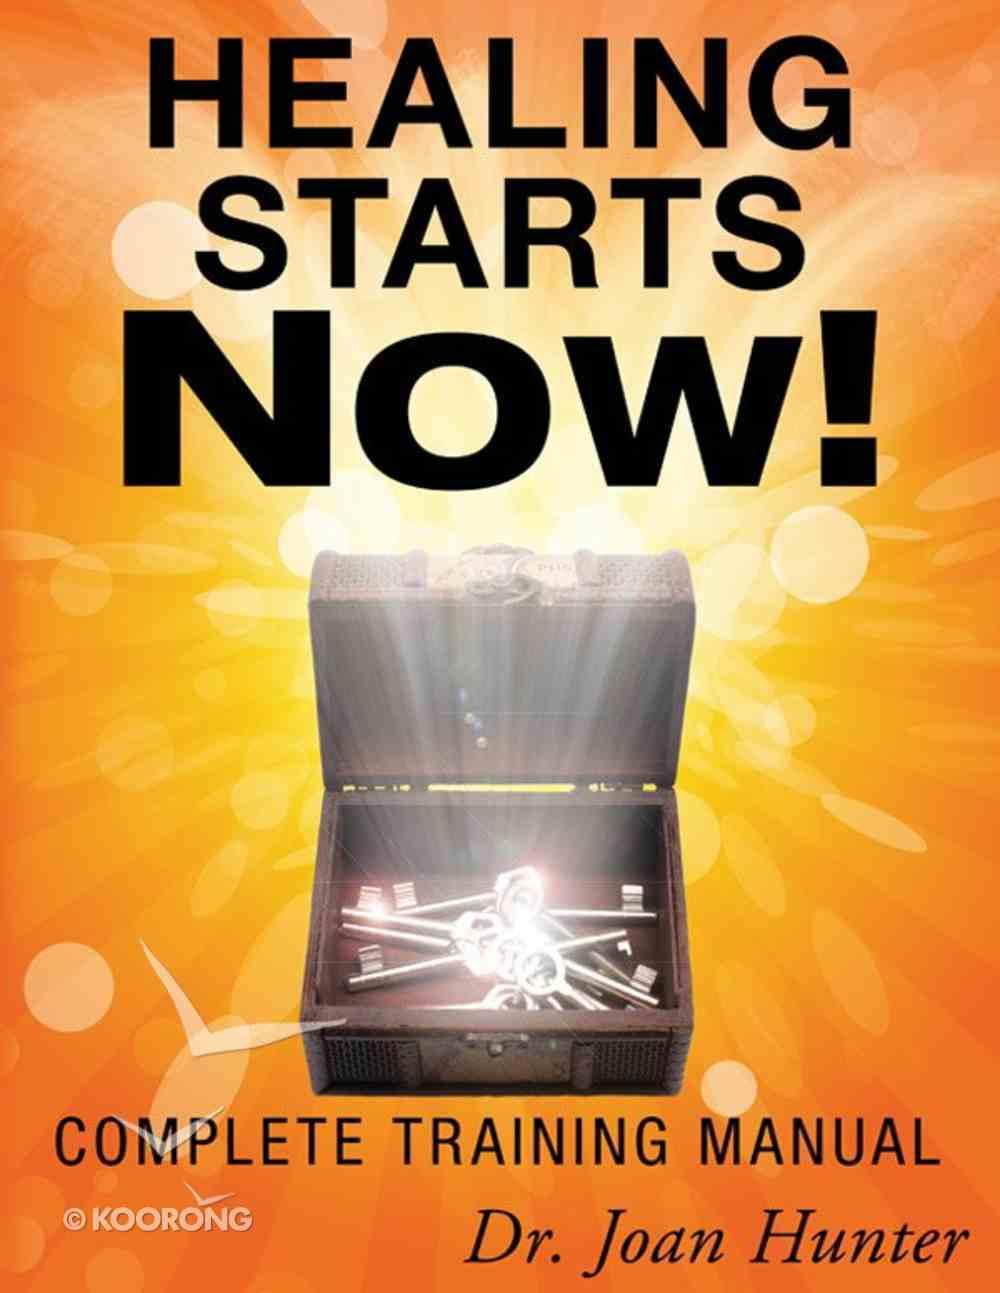 Healing Starts Now! eBook